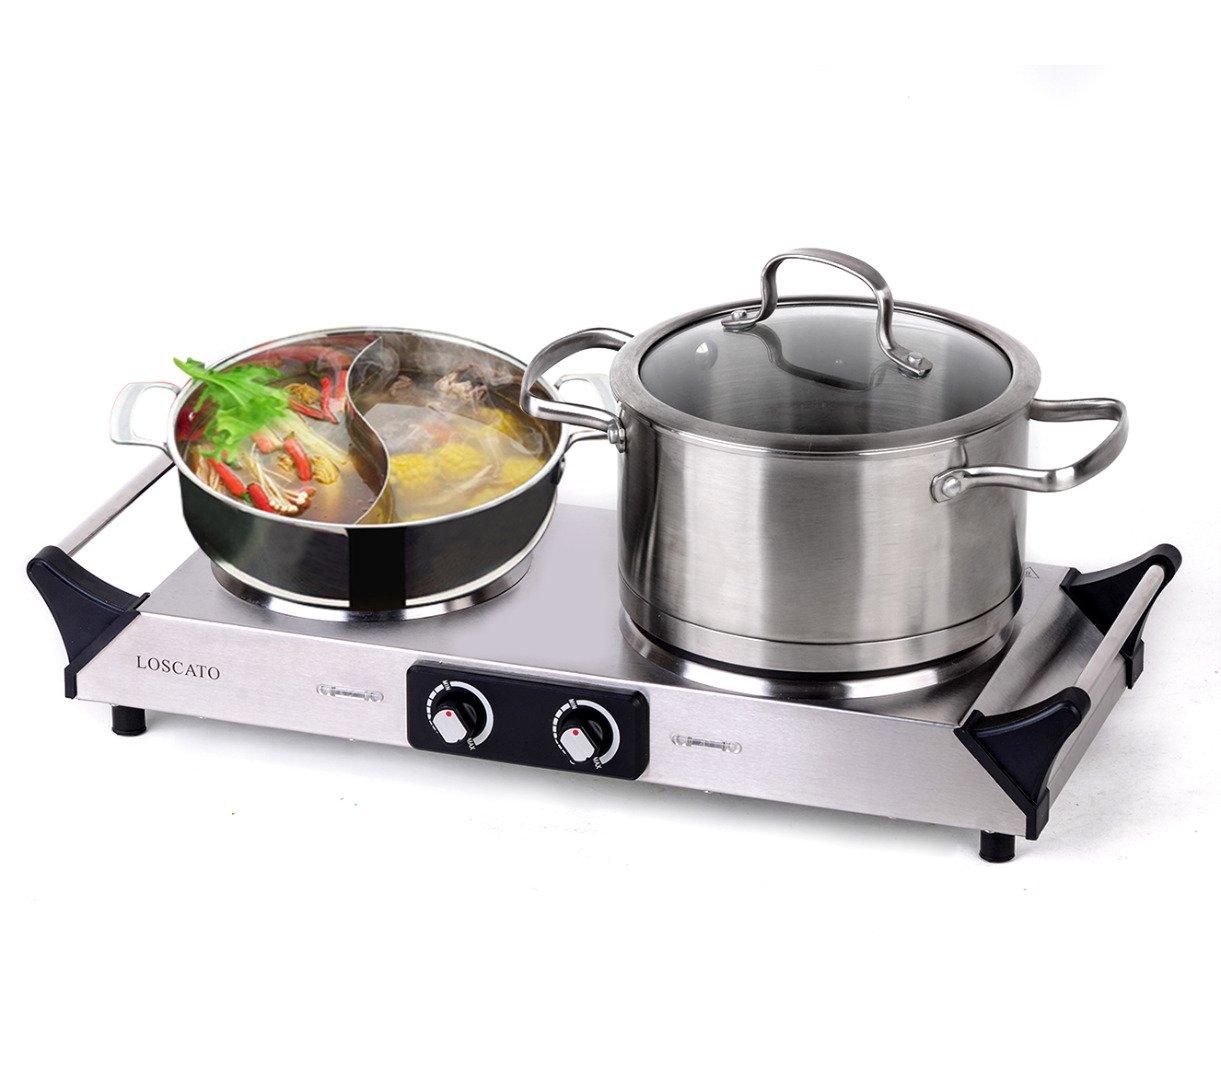 LOSCATO 1800W Portable Electric Cast Iron Cooktop Countertop Burner (Double Burner)